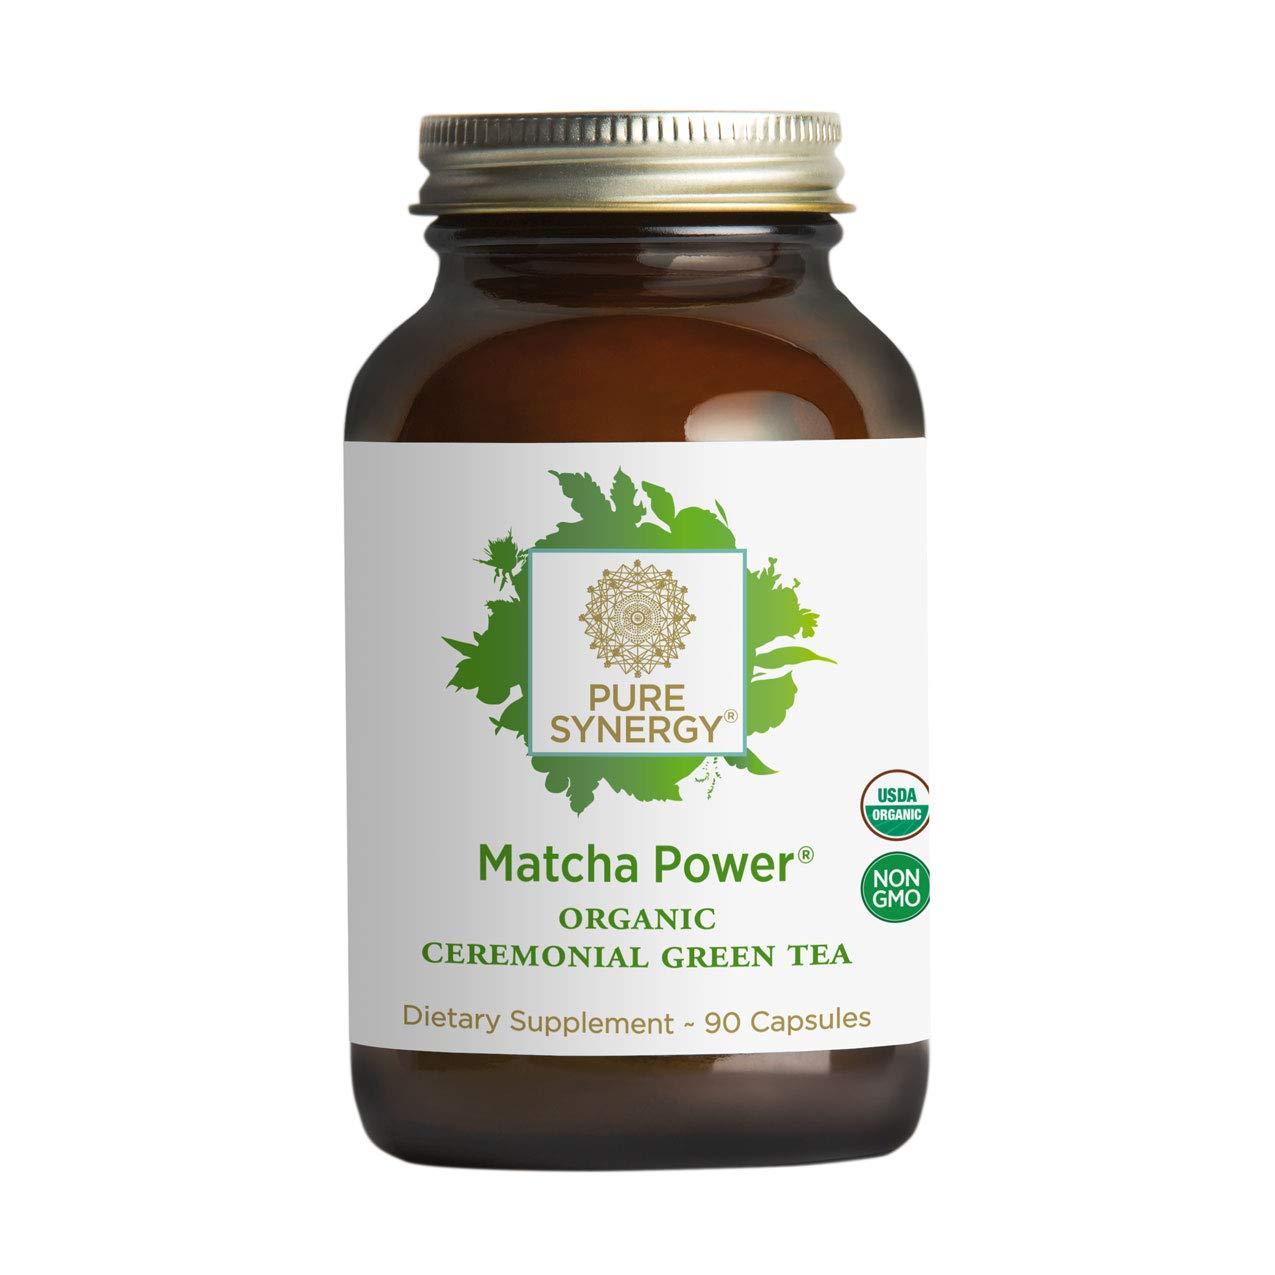 Pure Synergy USDA Organic Matcha Power (90 Capsules) Ceremonial Japanese Green Tea Convenient Capsules